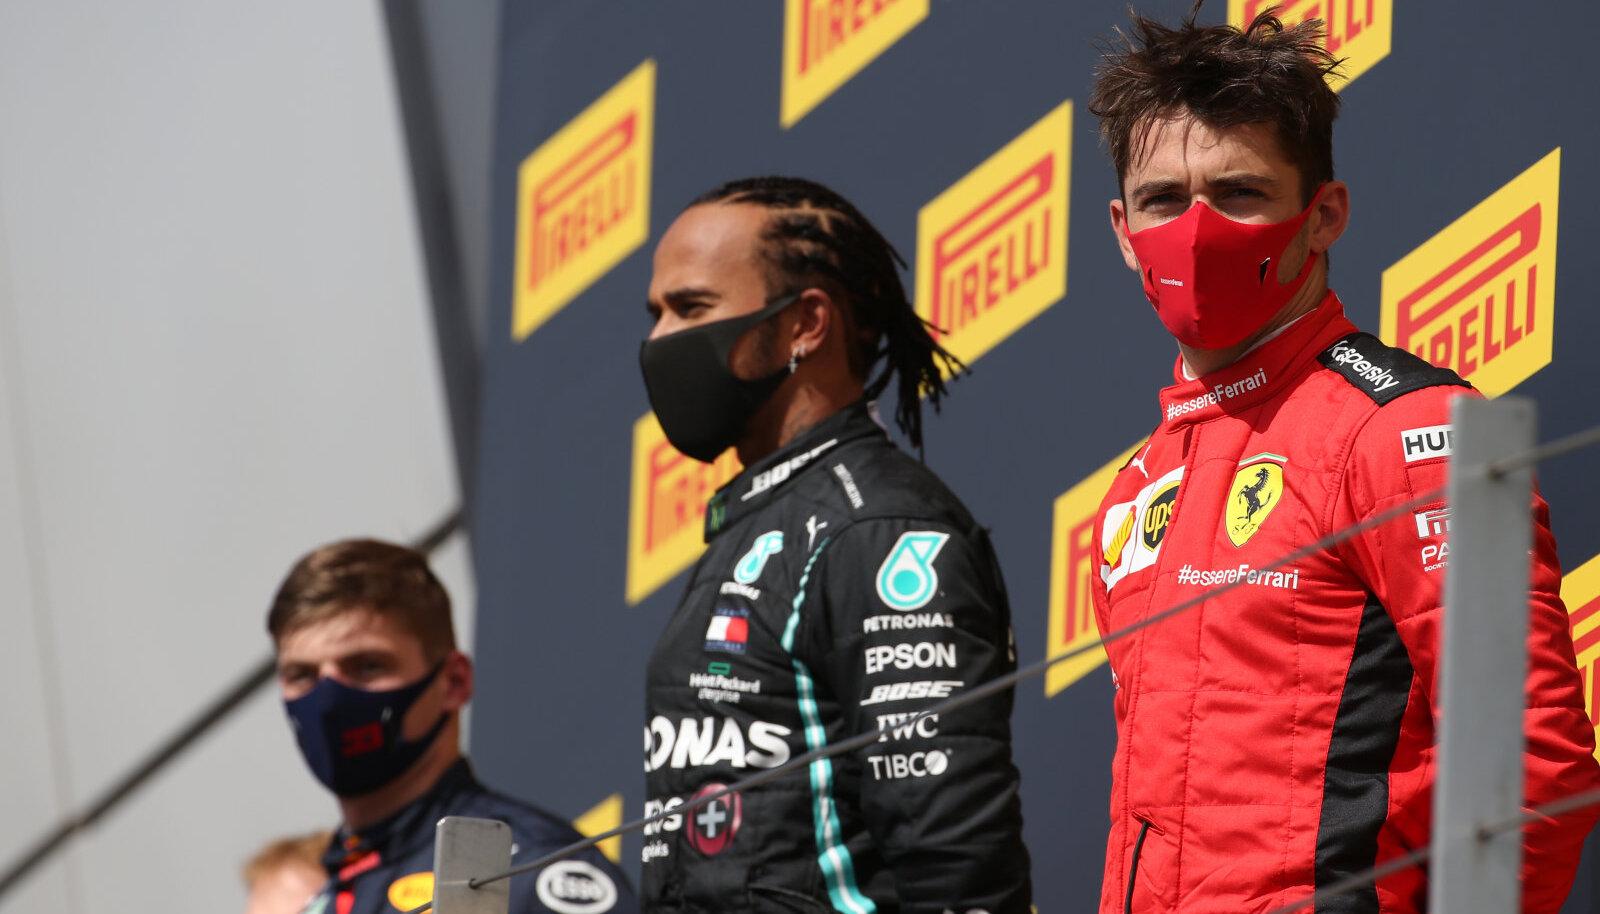 Max Verstappen, Lewis Hamilton ja Charles Leclerc